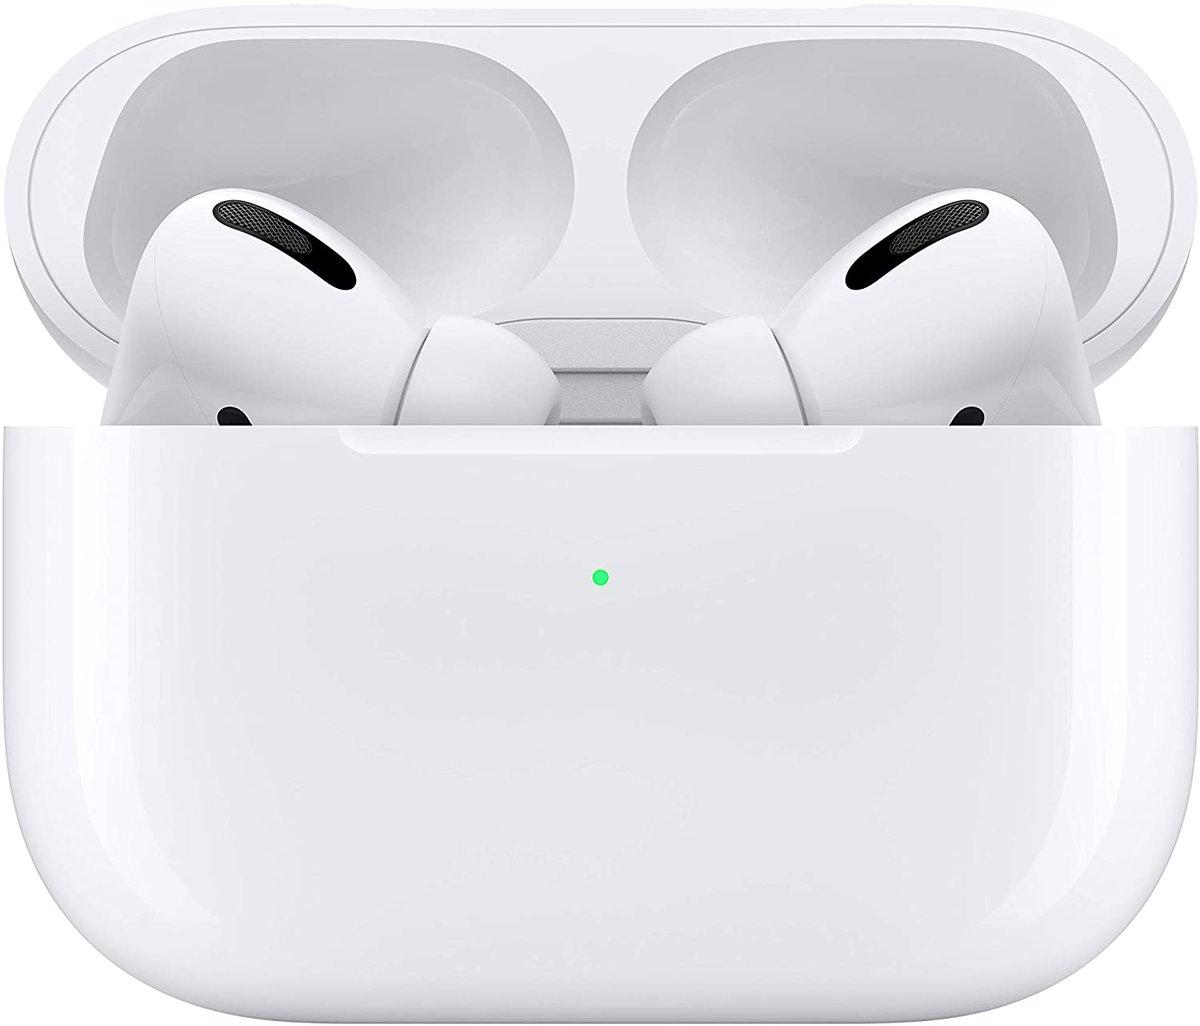 NEW Apple Airpods Pros for $219!!!  -Under retail, retail $250!!!  https://t.co/k4gjFyhg3F https://t.co/whs7jKjJxQ